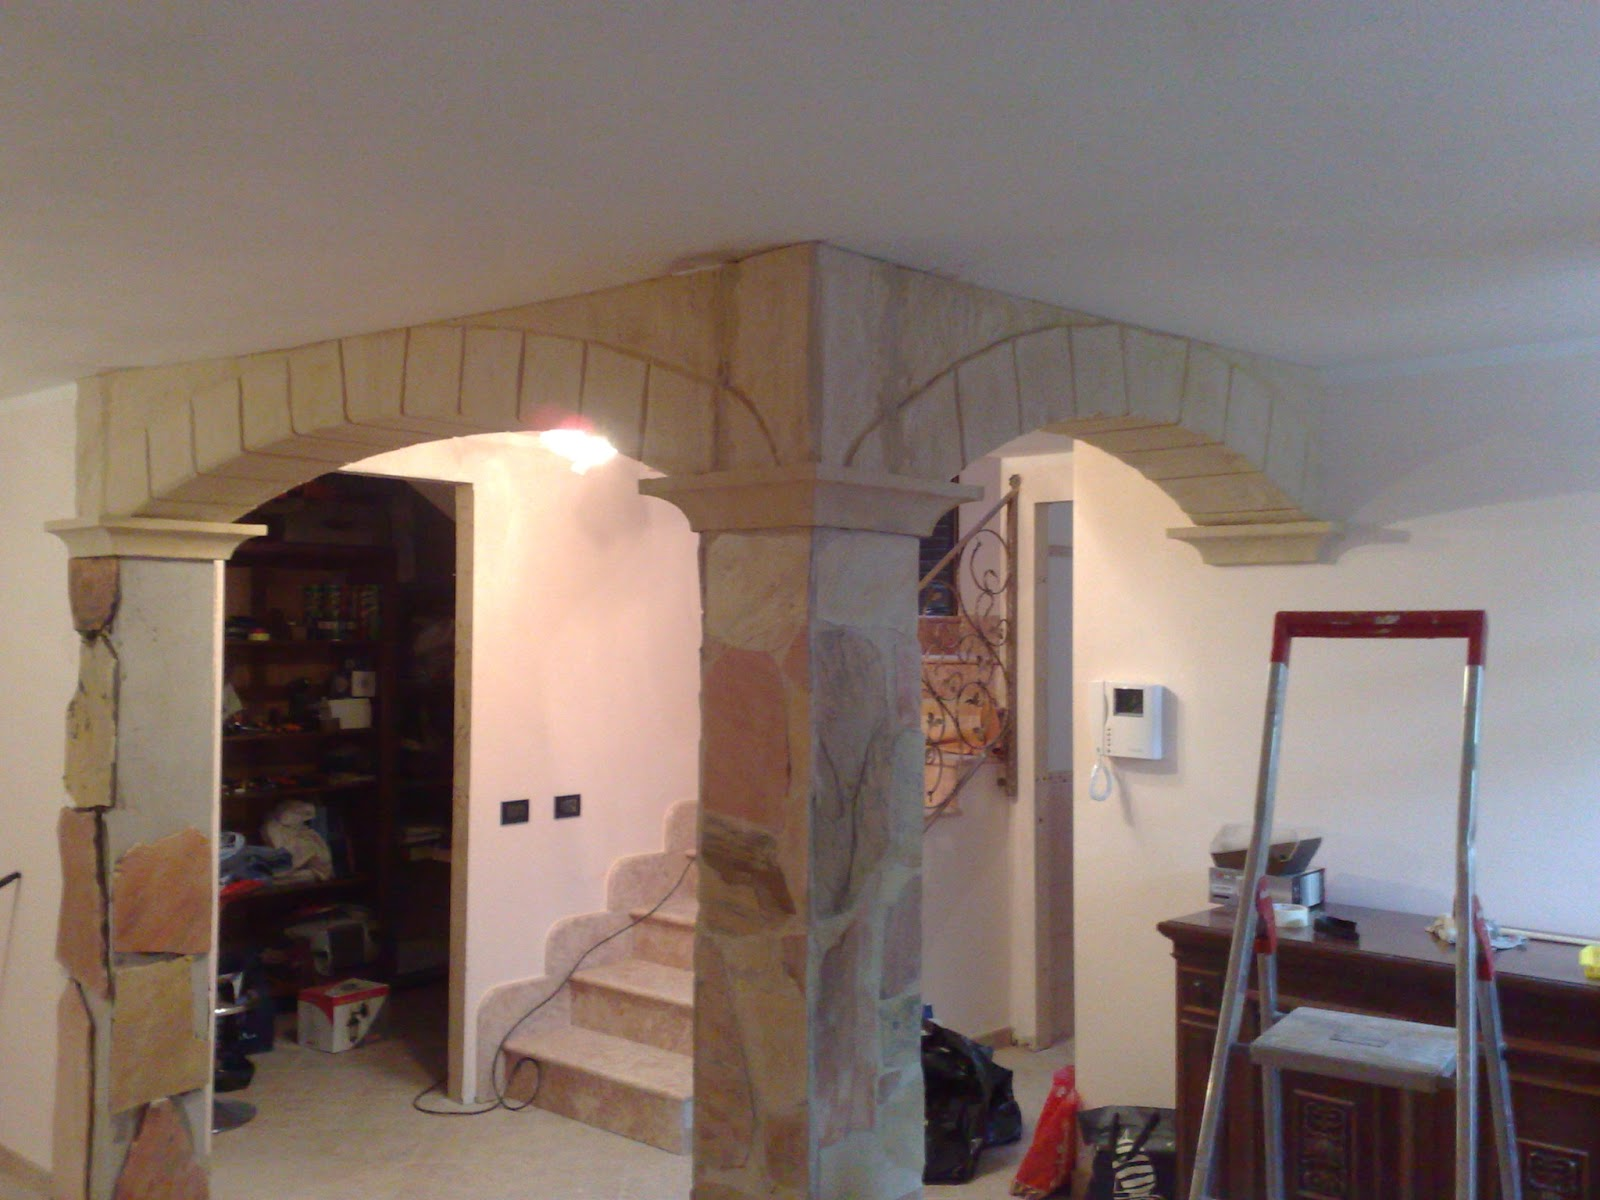 Pannelli isolanti decorativi - Sassi decorativi per interni ...